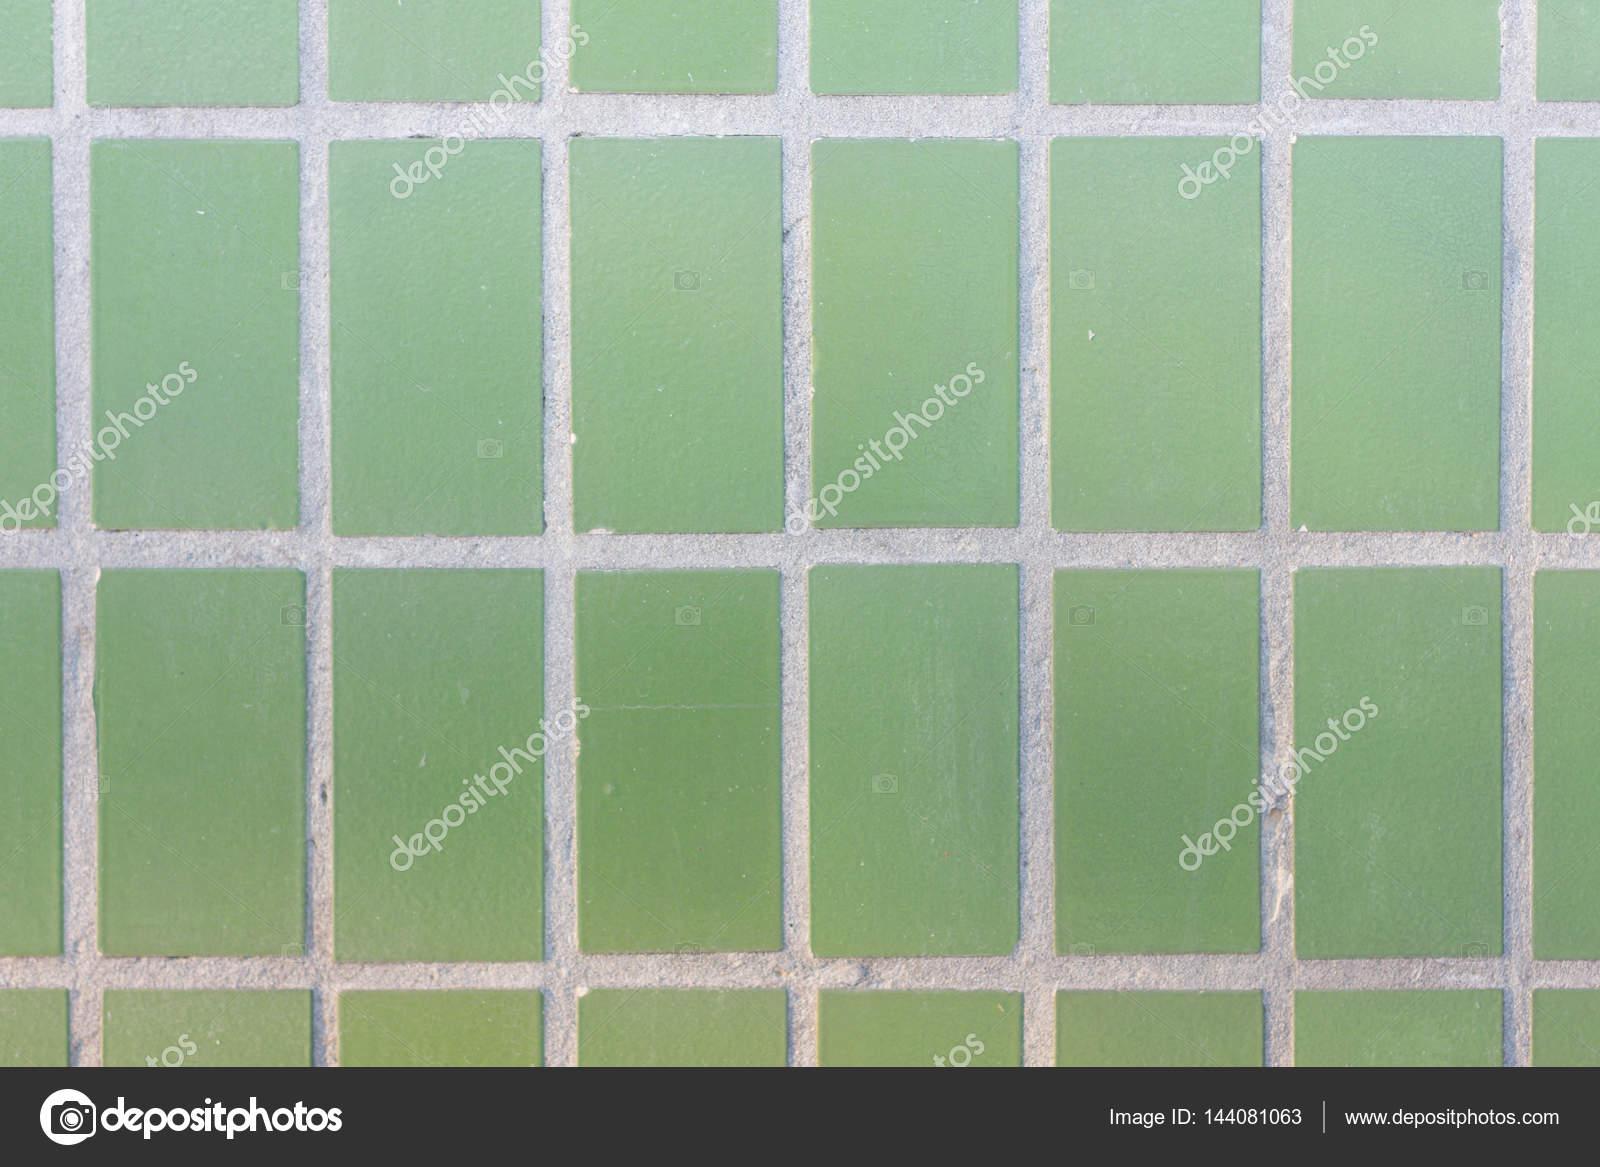 Facade Of Green Mat Ceramic Tile Texture Geometric Figures